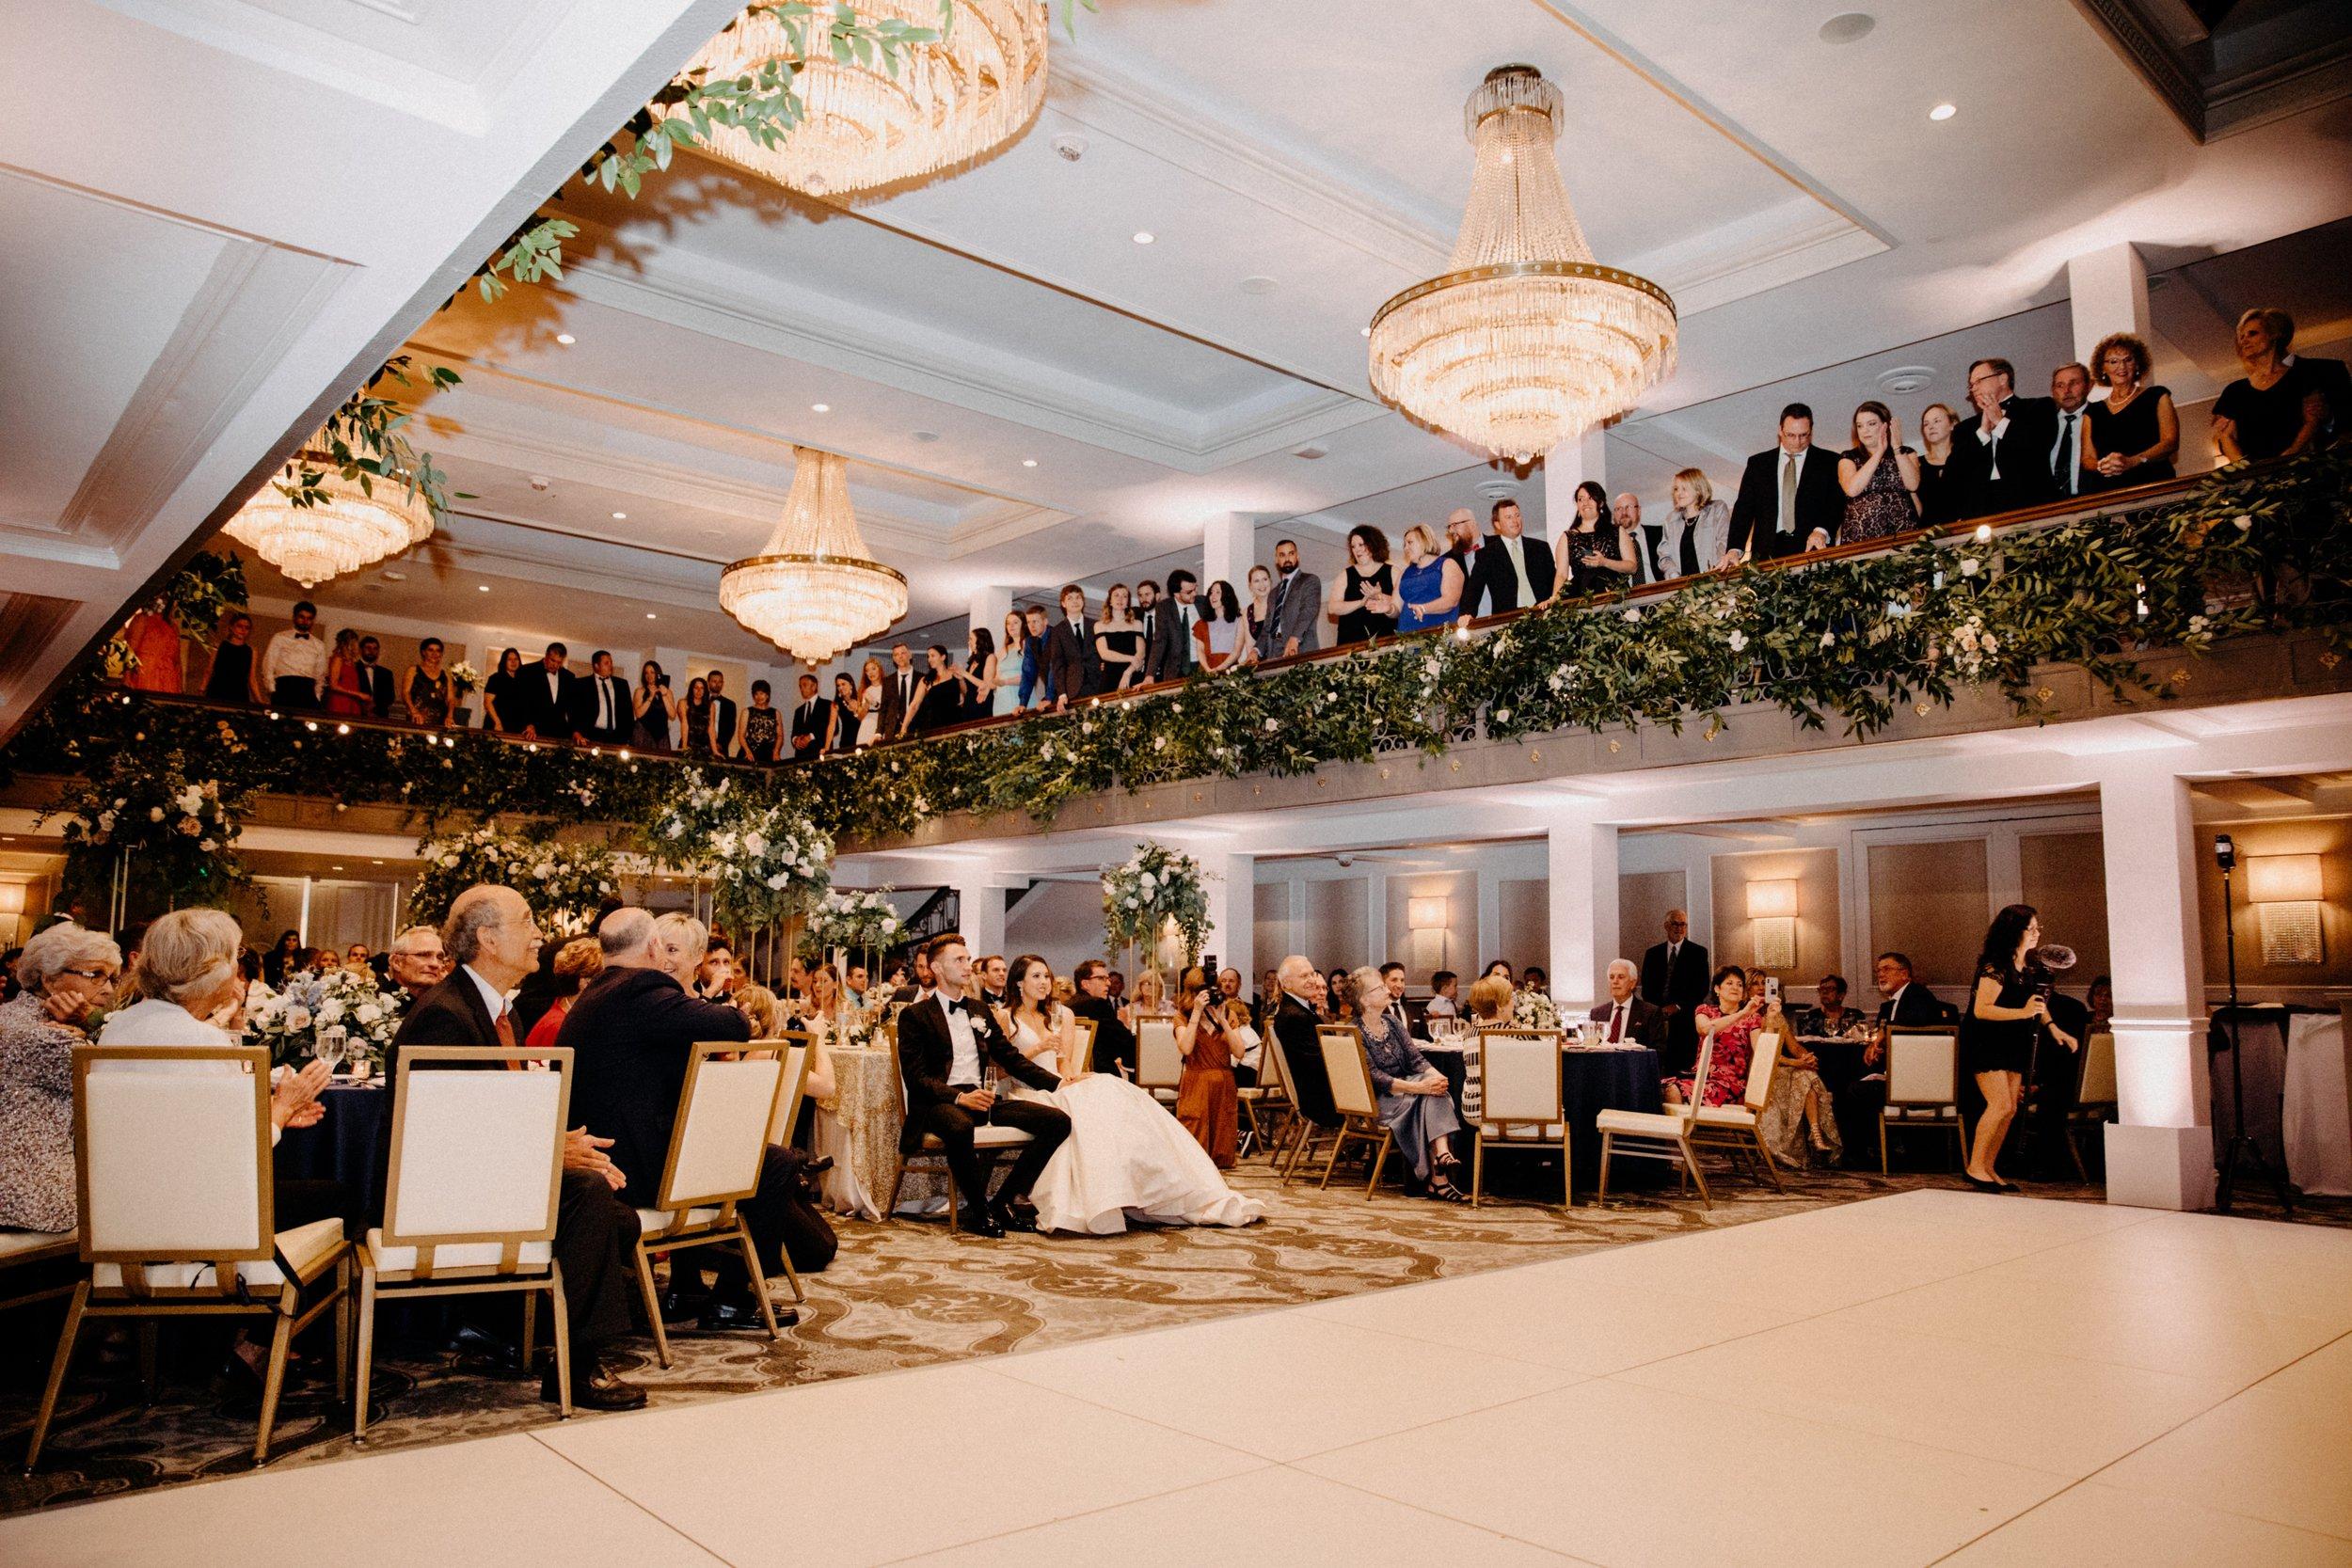 st-anthony-hotel-wedding-photography-10140san-antonio.JPG